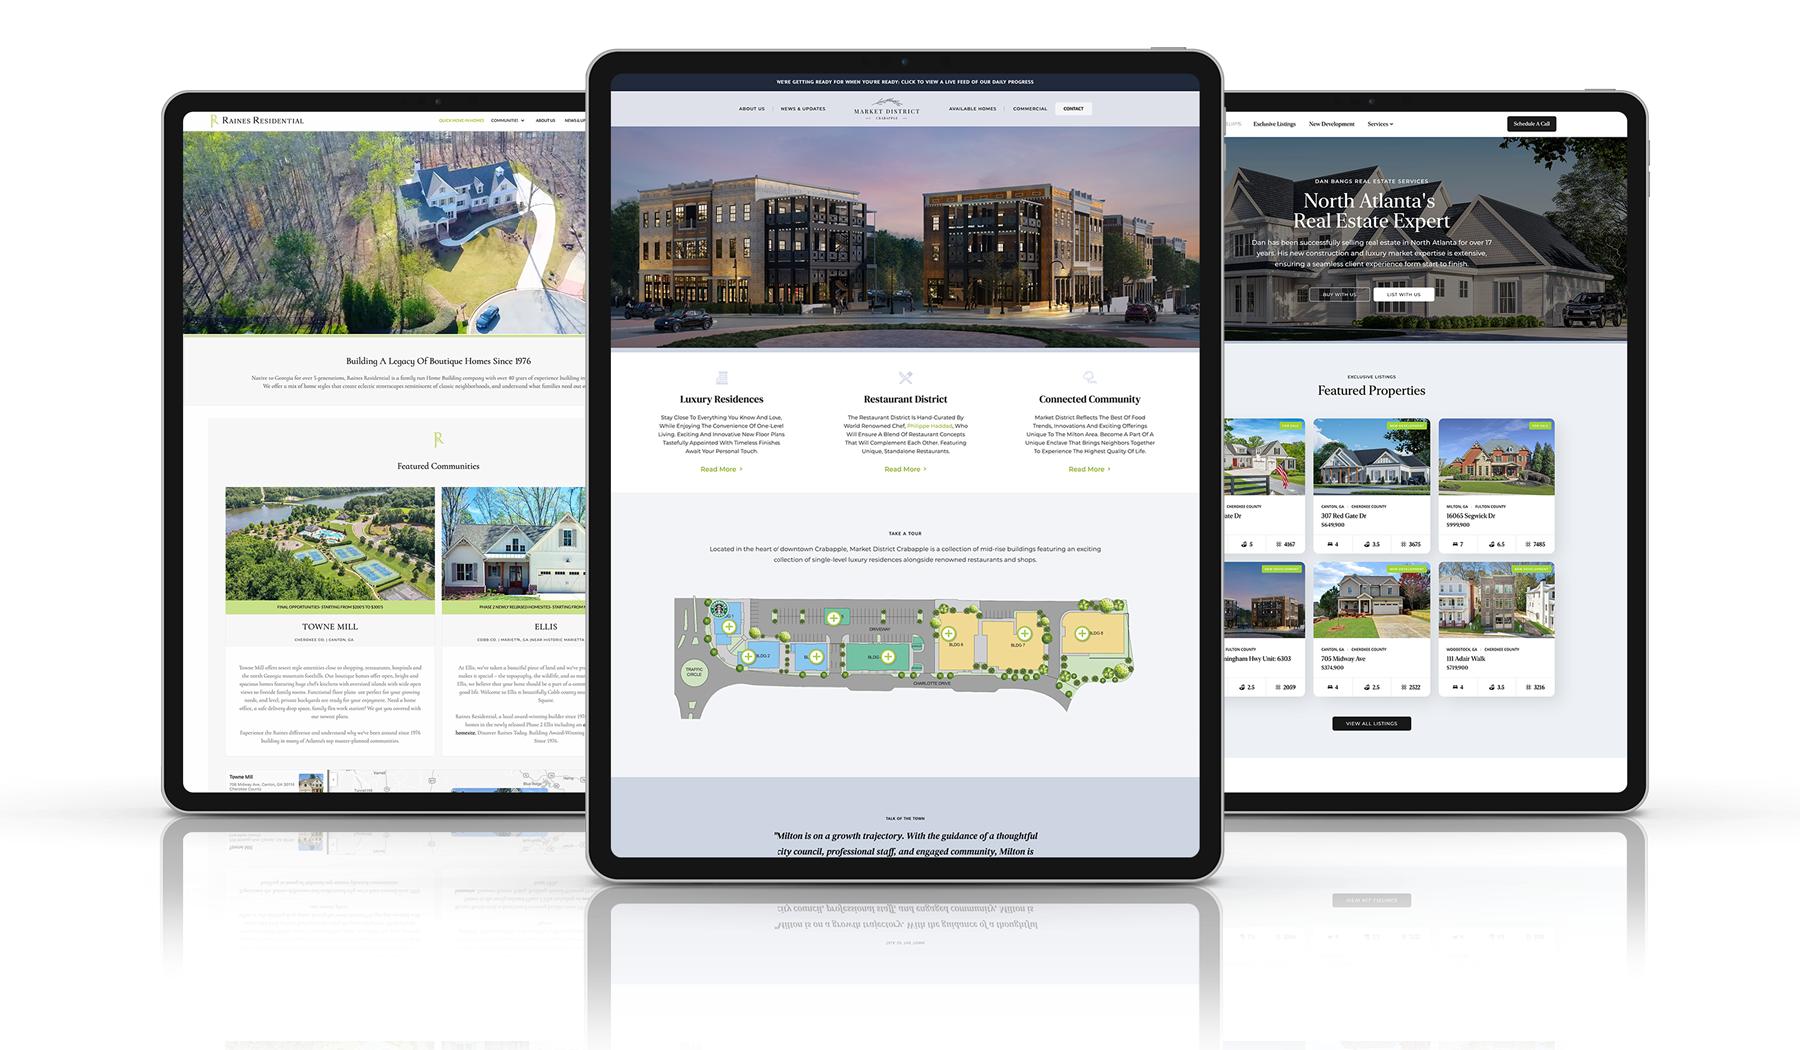 Real Estate Marketing - Web Design